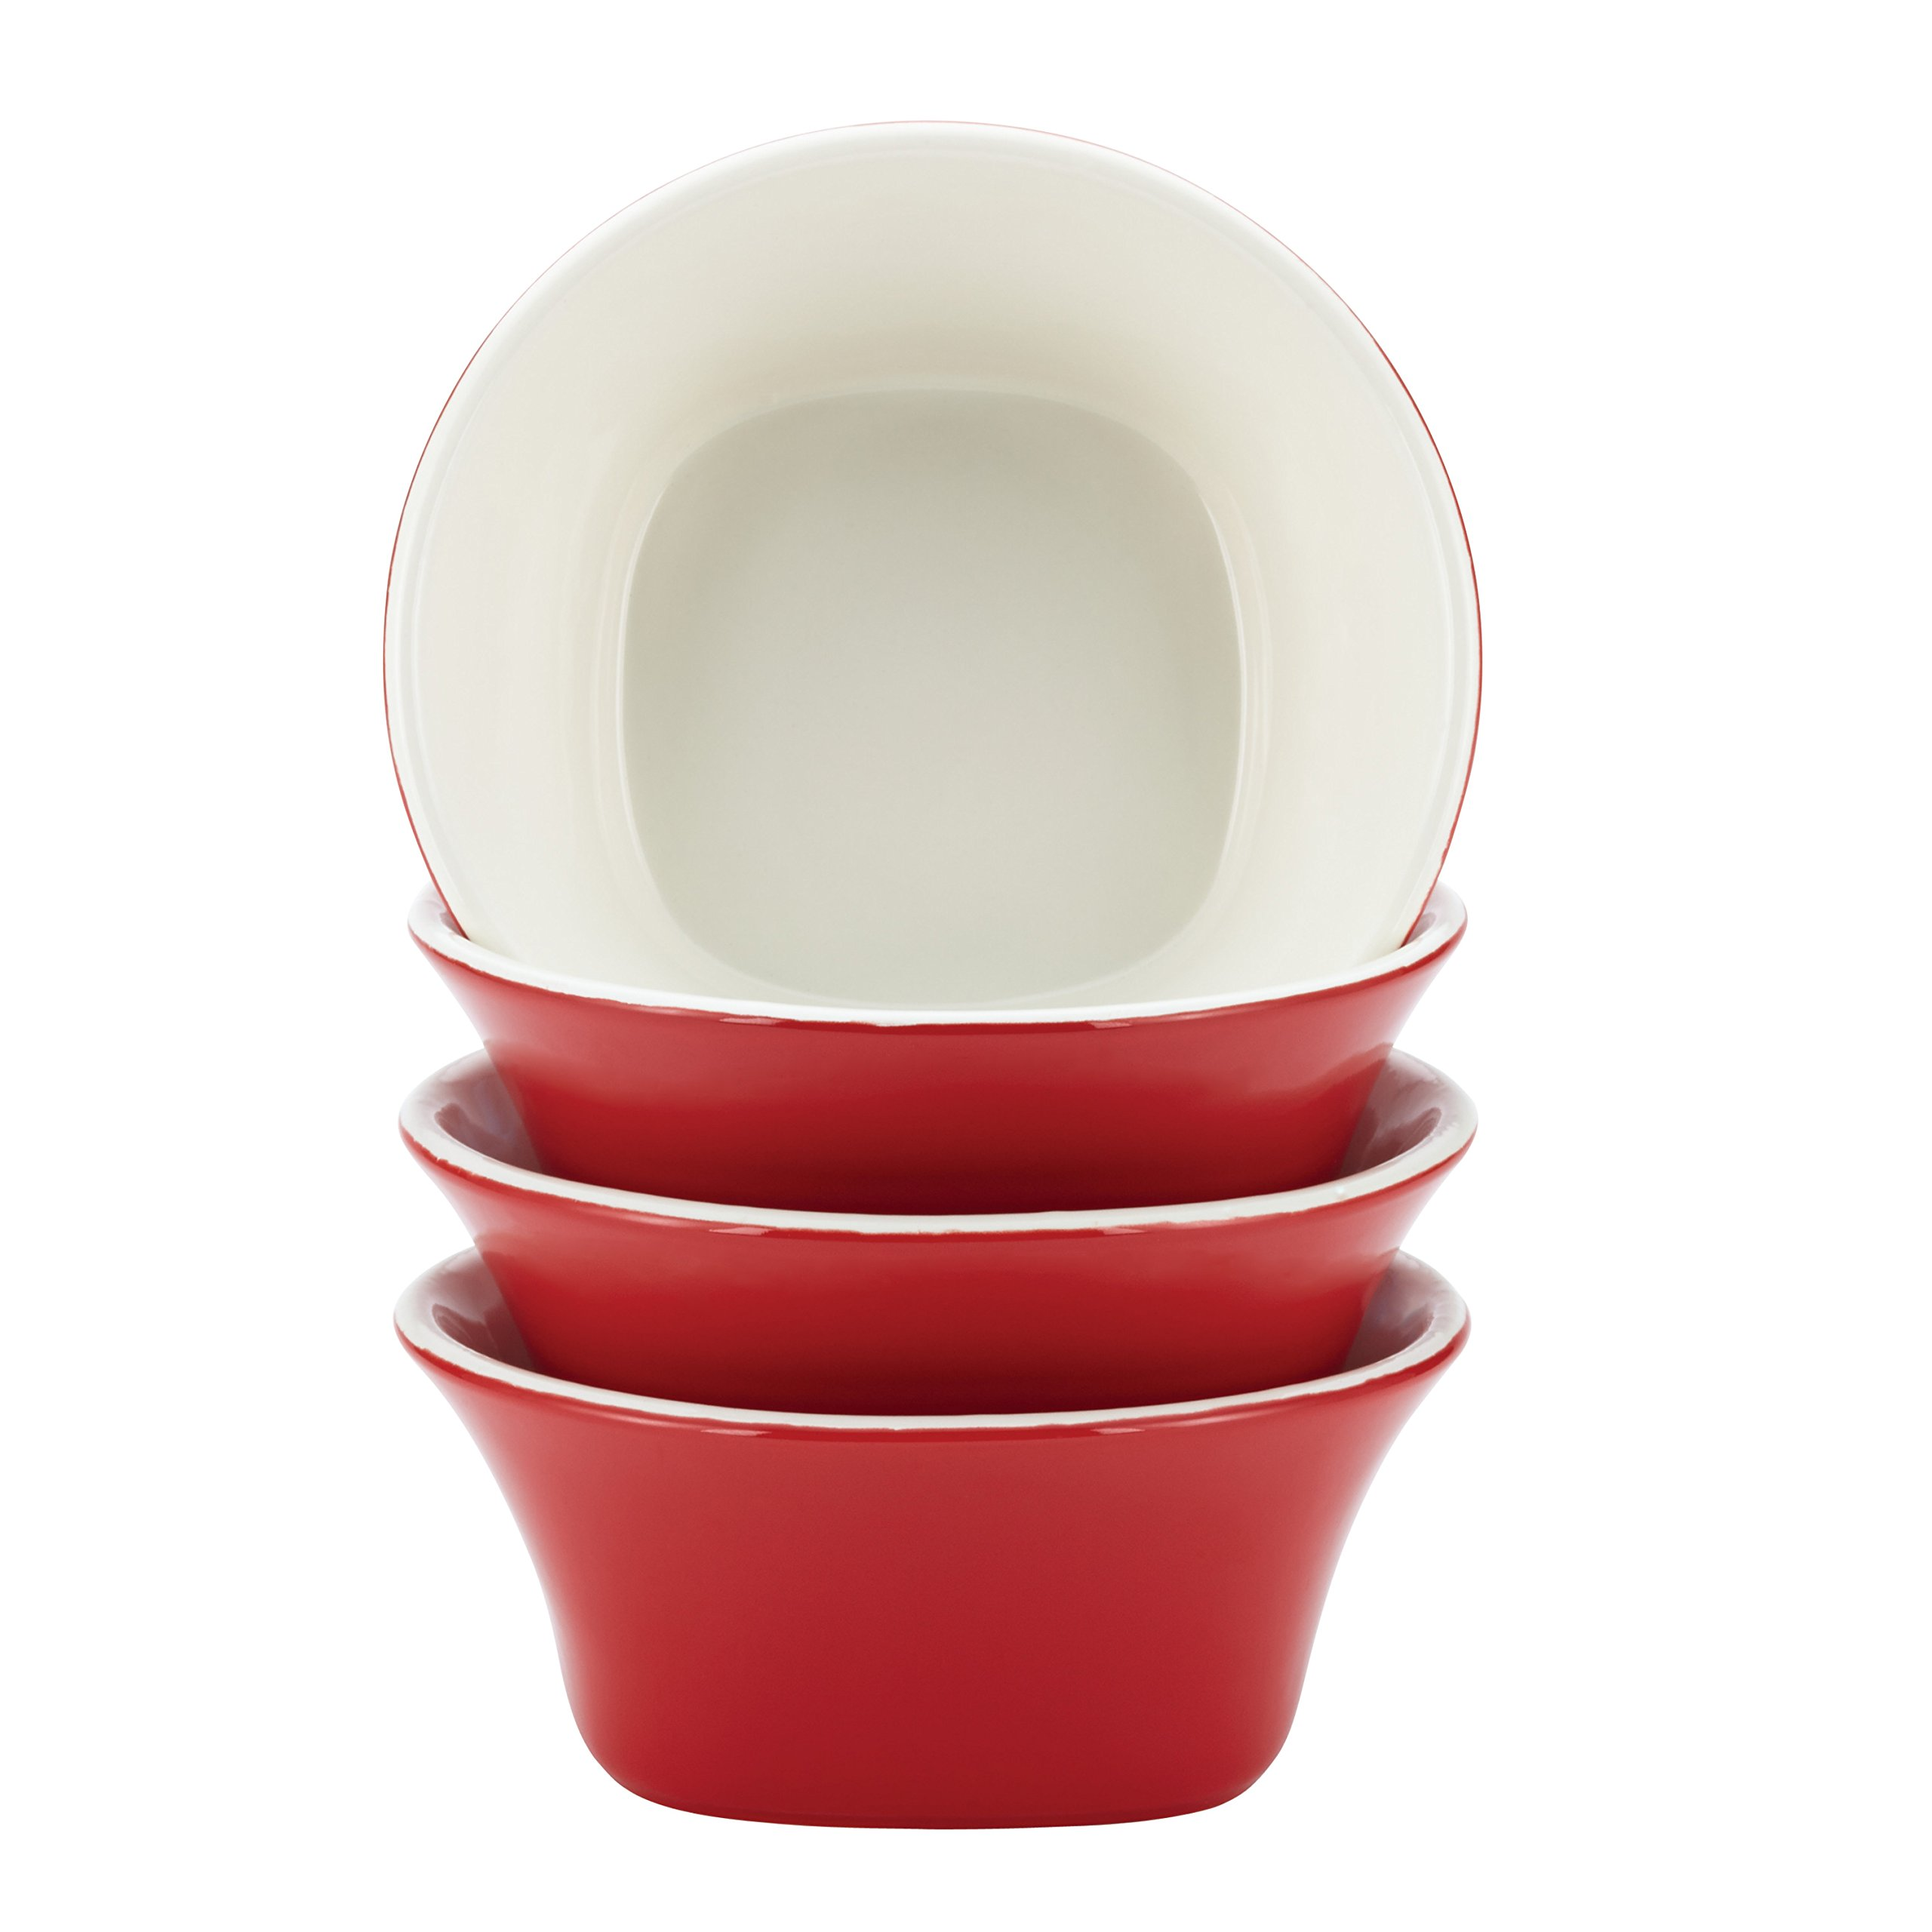 Rachael Ray Dinnerware Round & Square 4-Piece Stoneware Fruit Bowl Set, Red